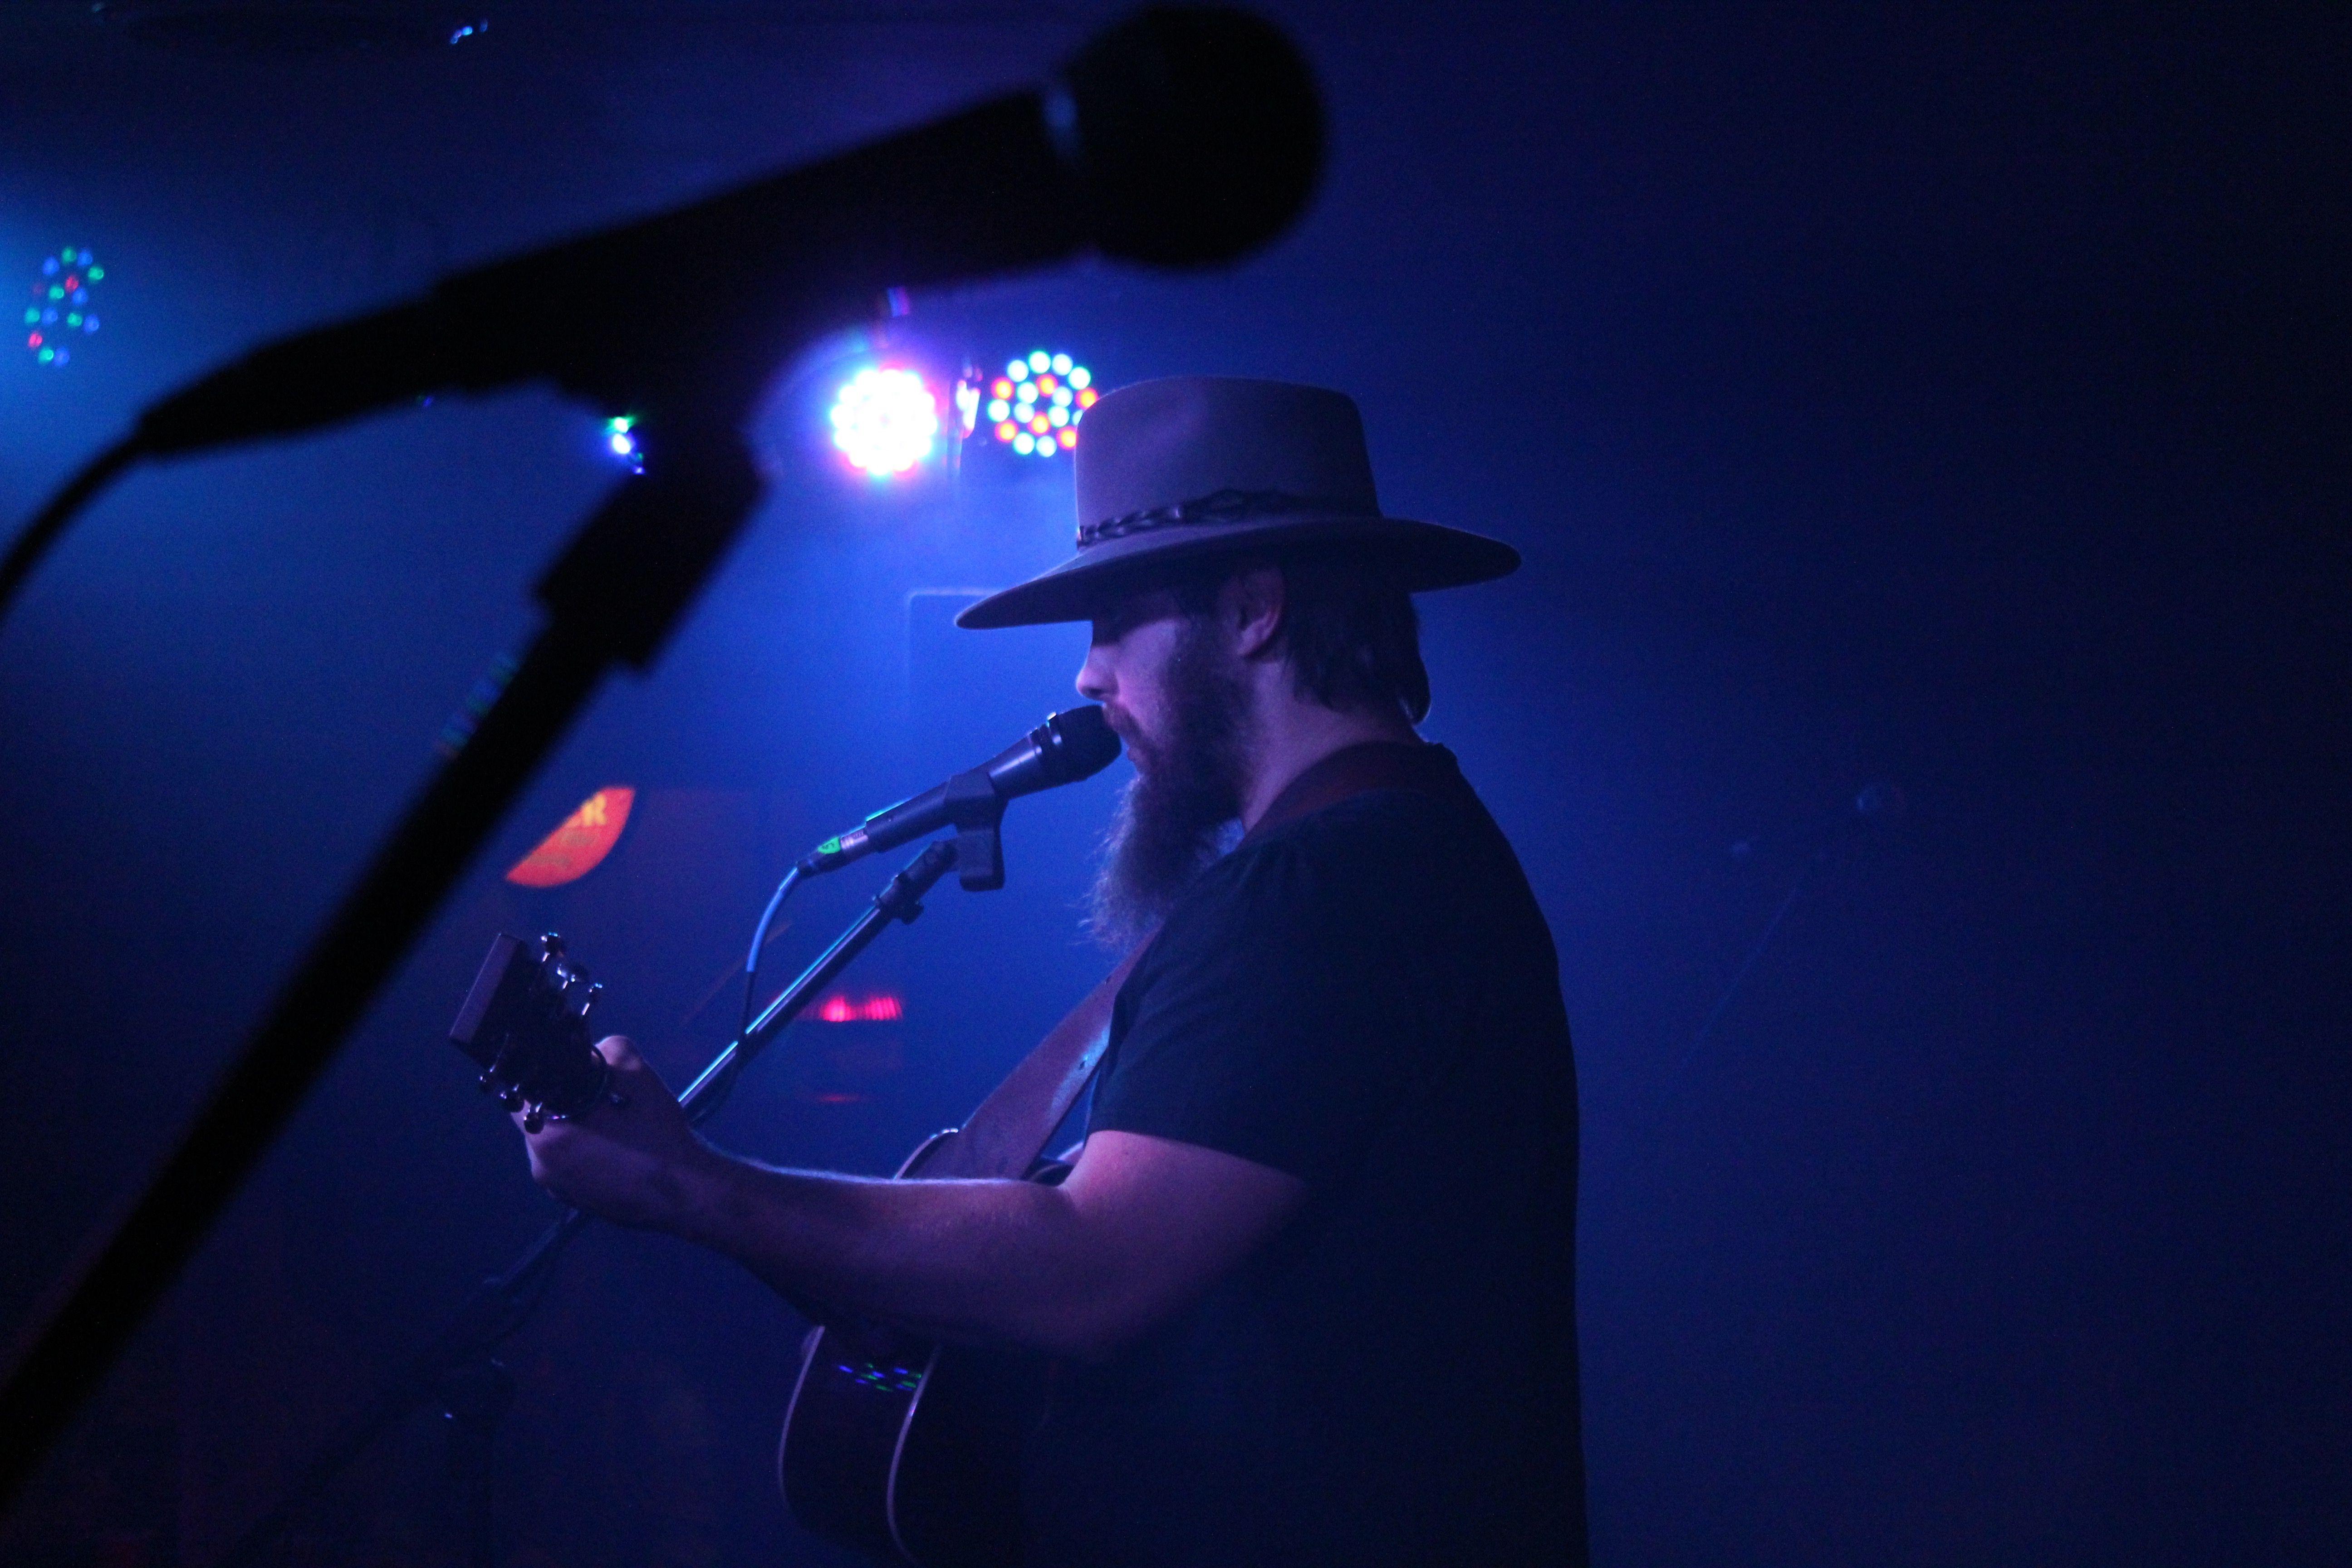 He's 🔥🔥 #beardedmen #musician #countrysinger #singersongwriter #music #musicman